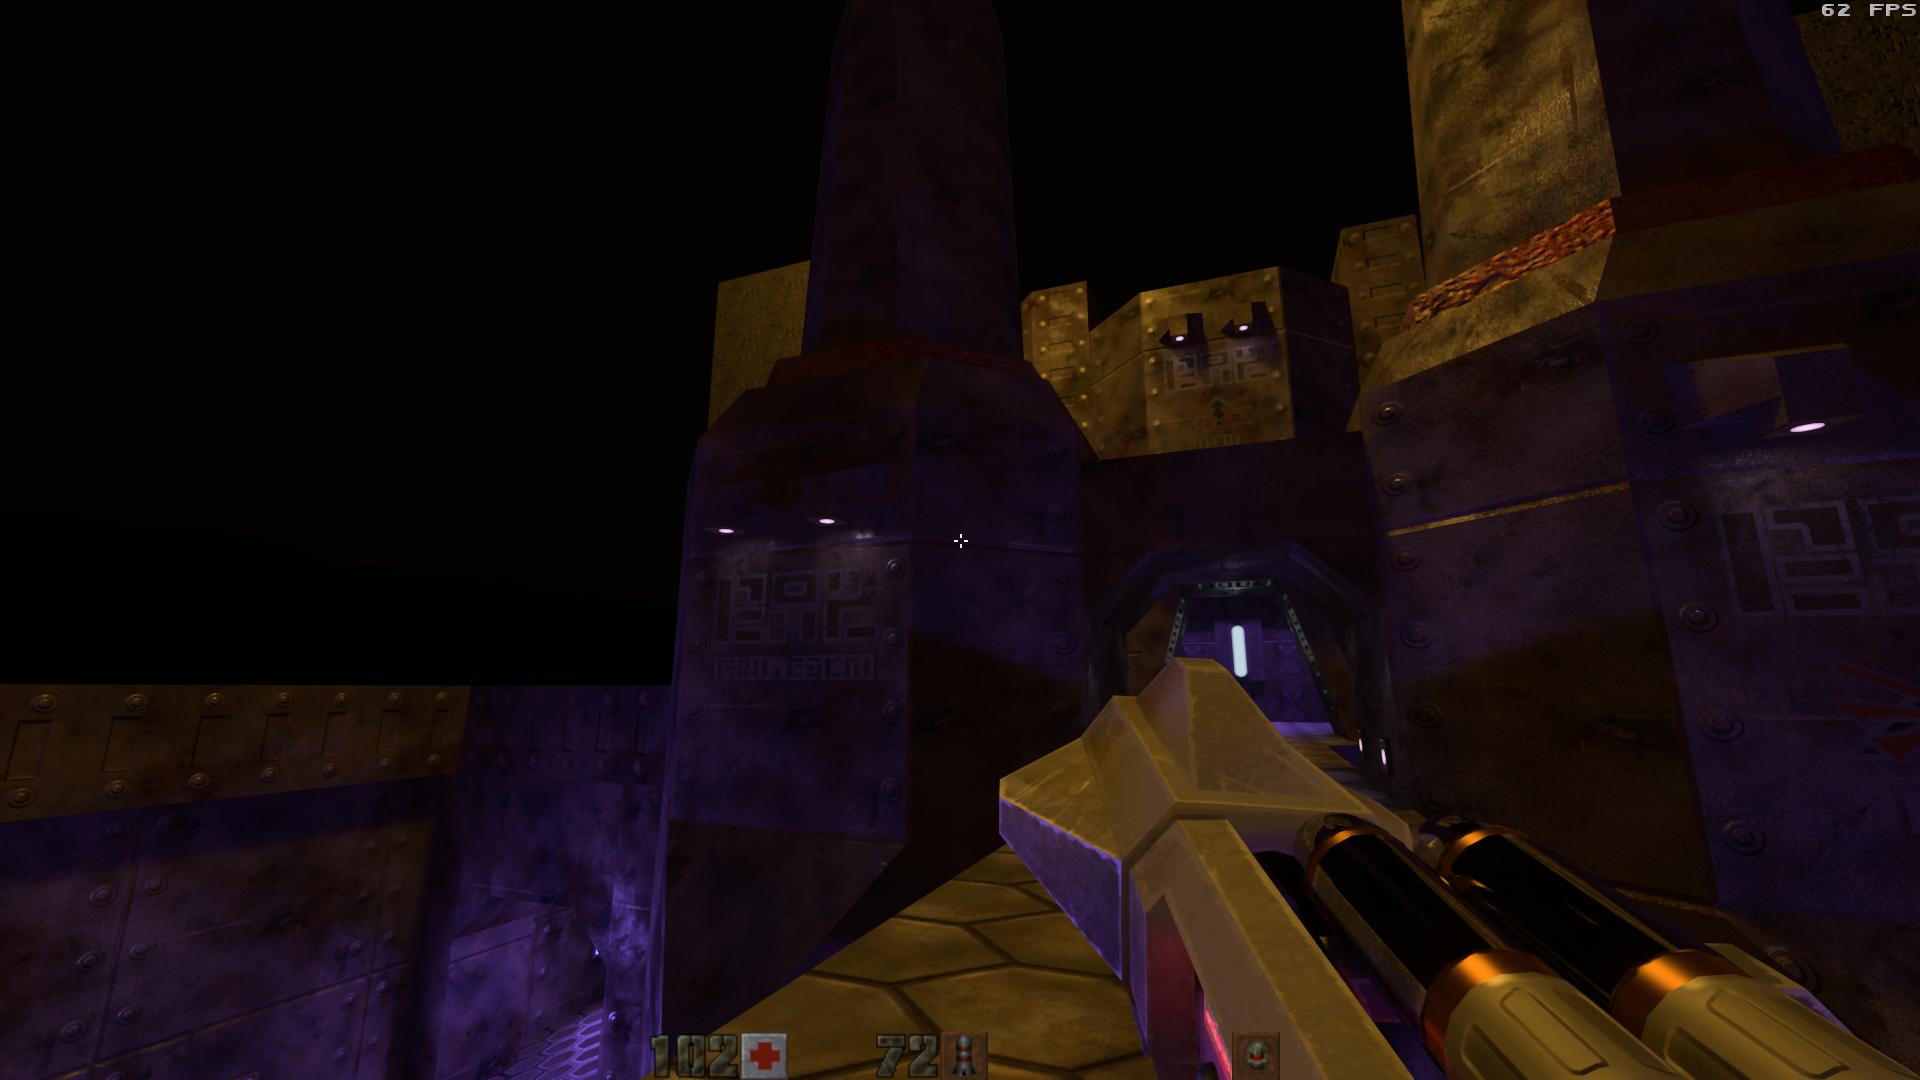 Quake 2 RTX Remaster Screenshot 2019.11.28 - 19.18.34.33.png